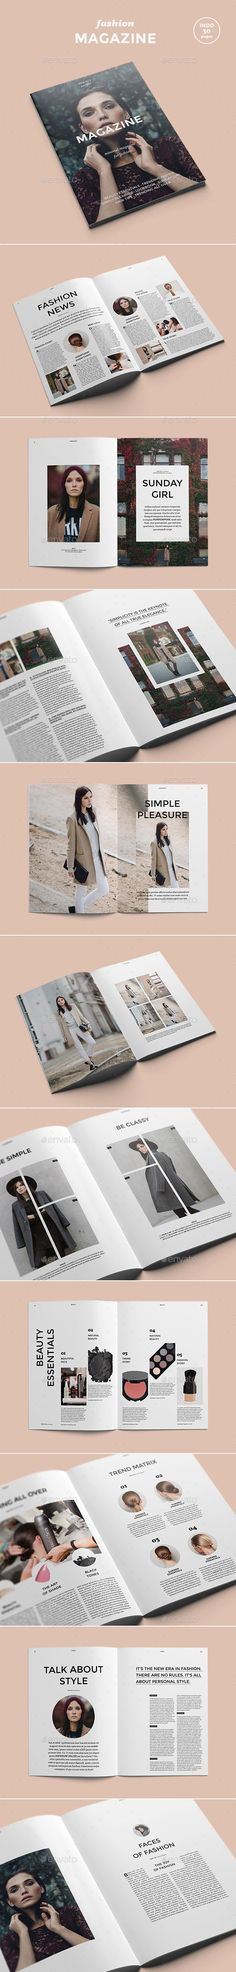 Fashion Magazine - Magazines Print Templates: